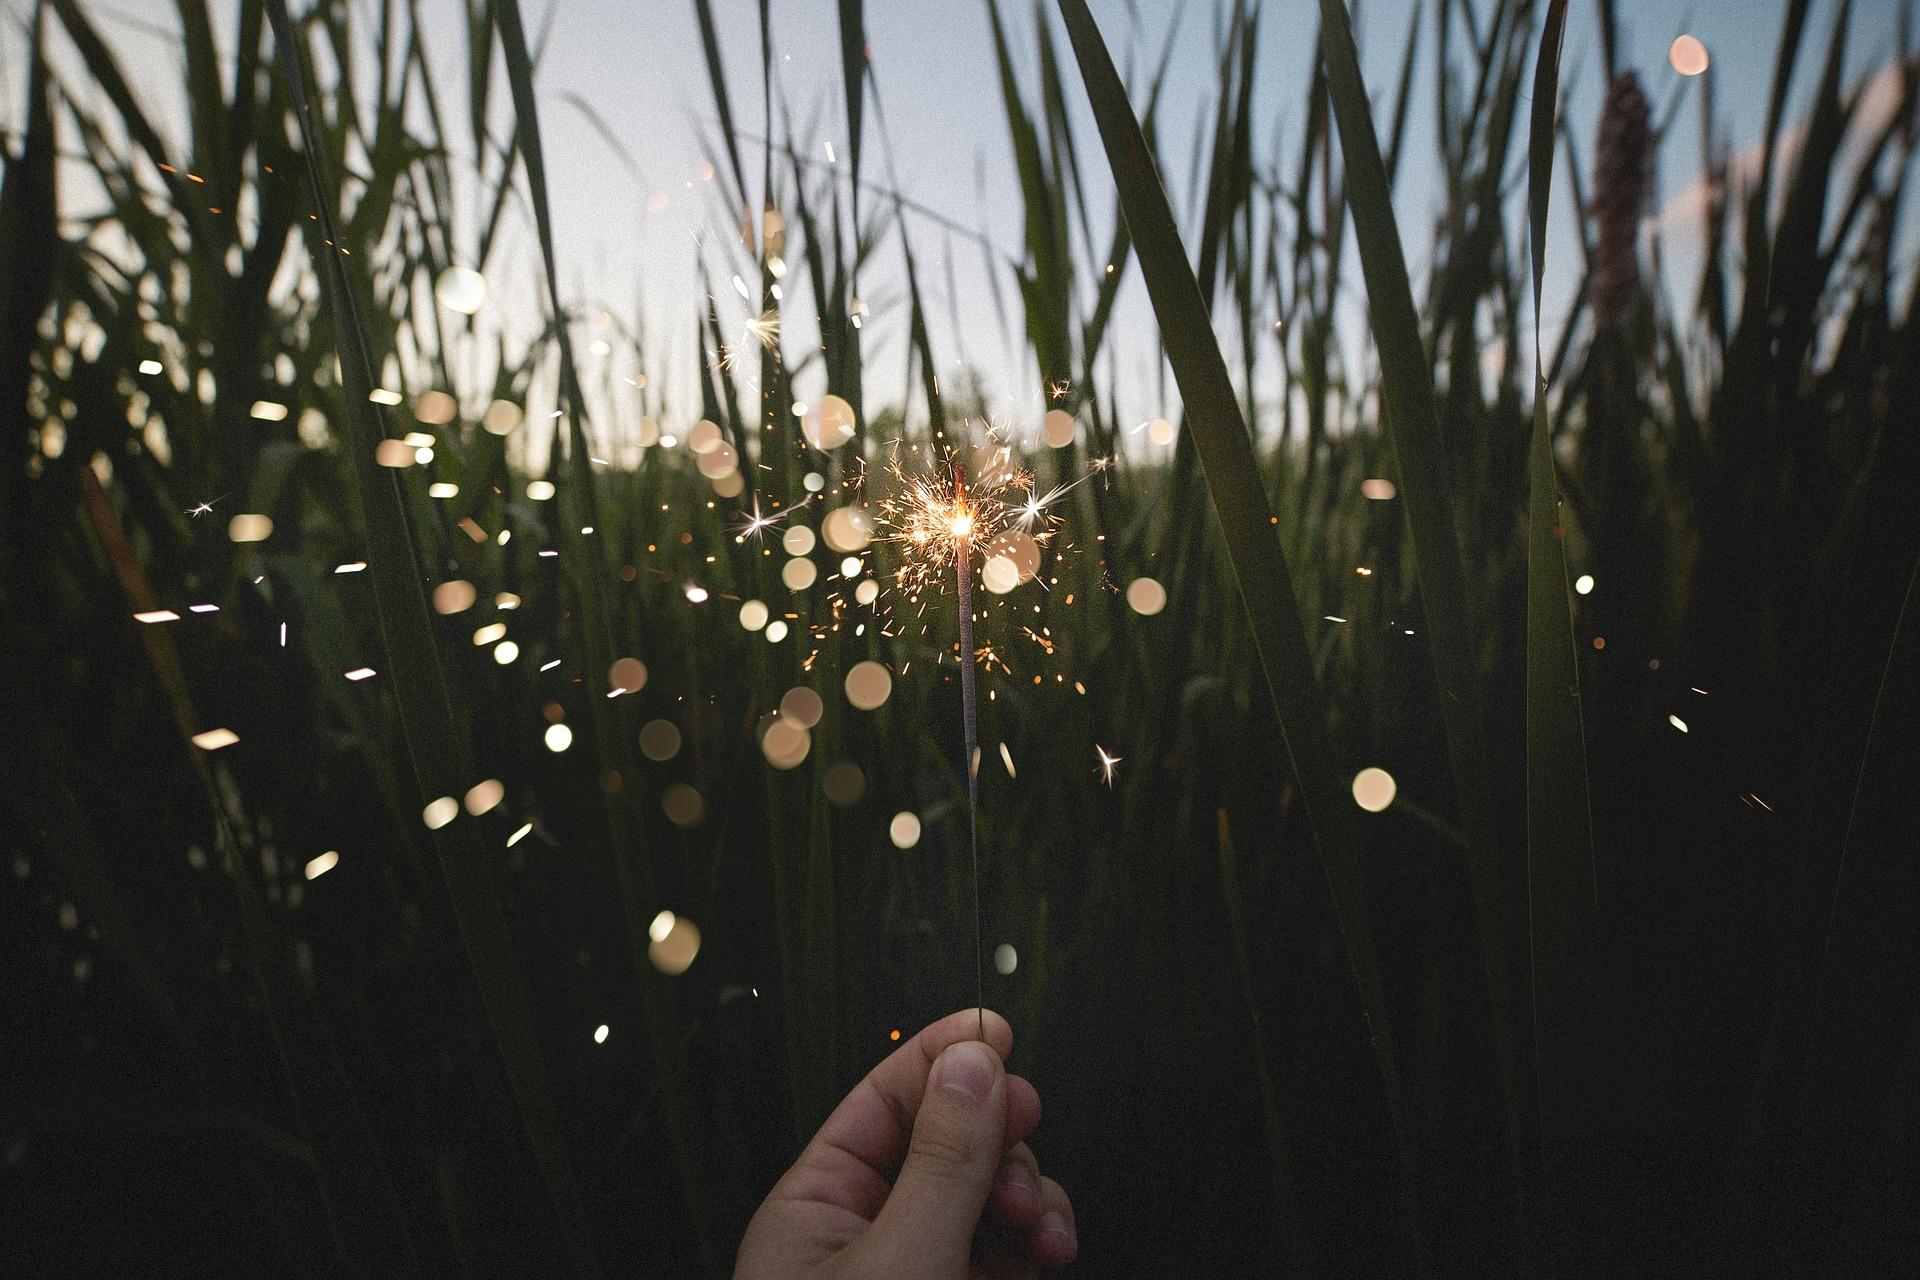 Sparkler on the backdrop of a grassy field